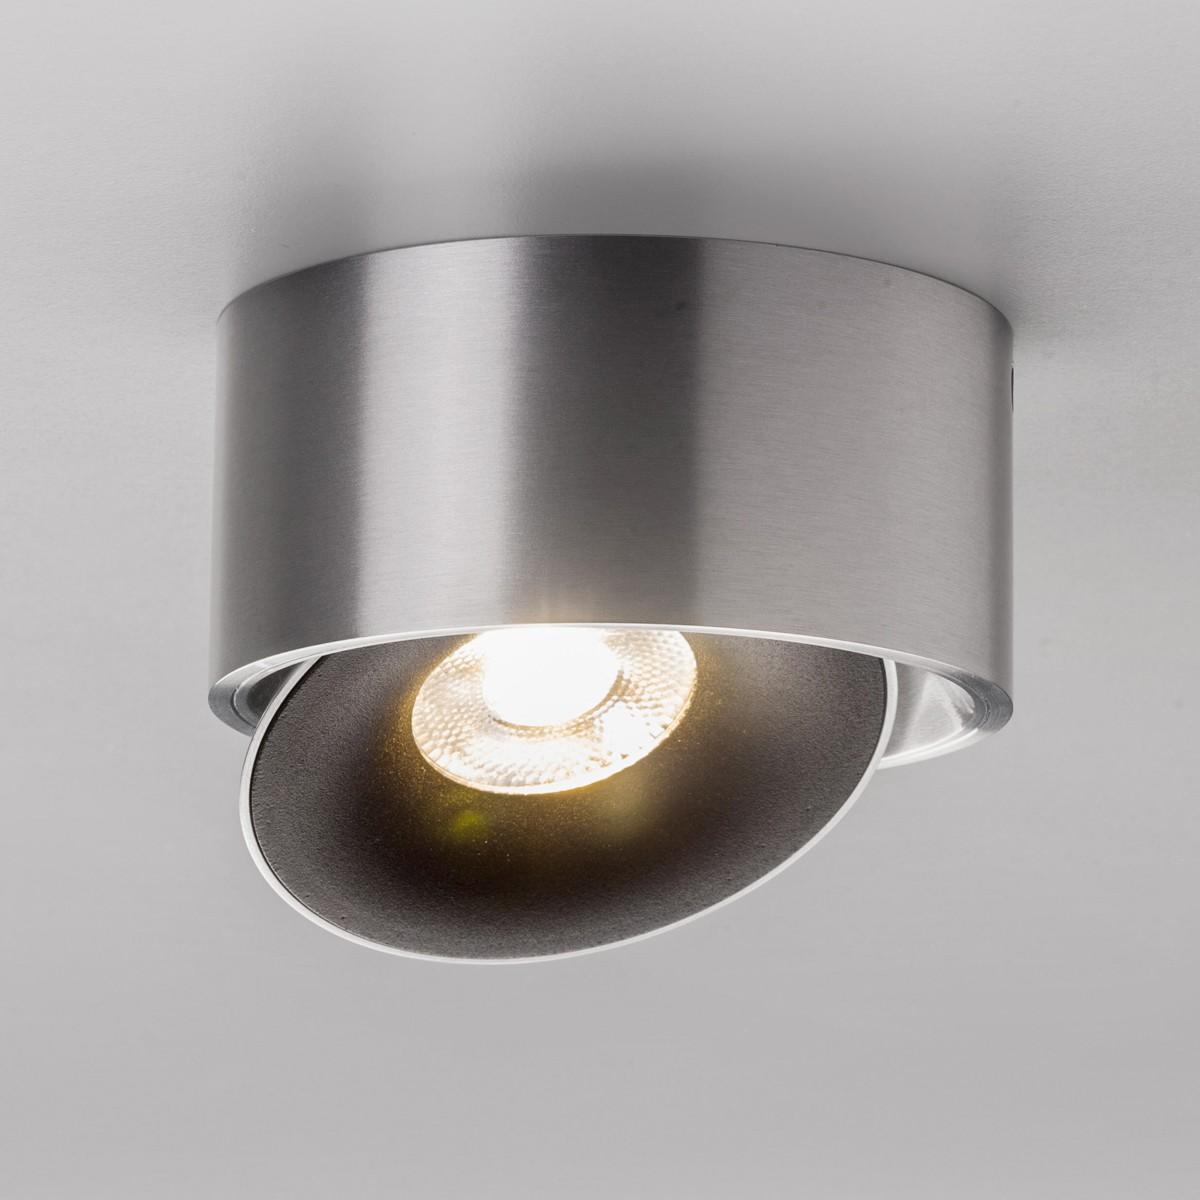 Lupia Licht Saturn Deckenstrahler, Aluminium matt